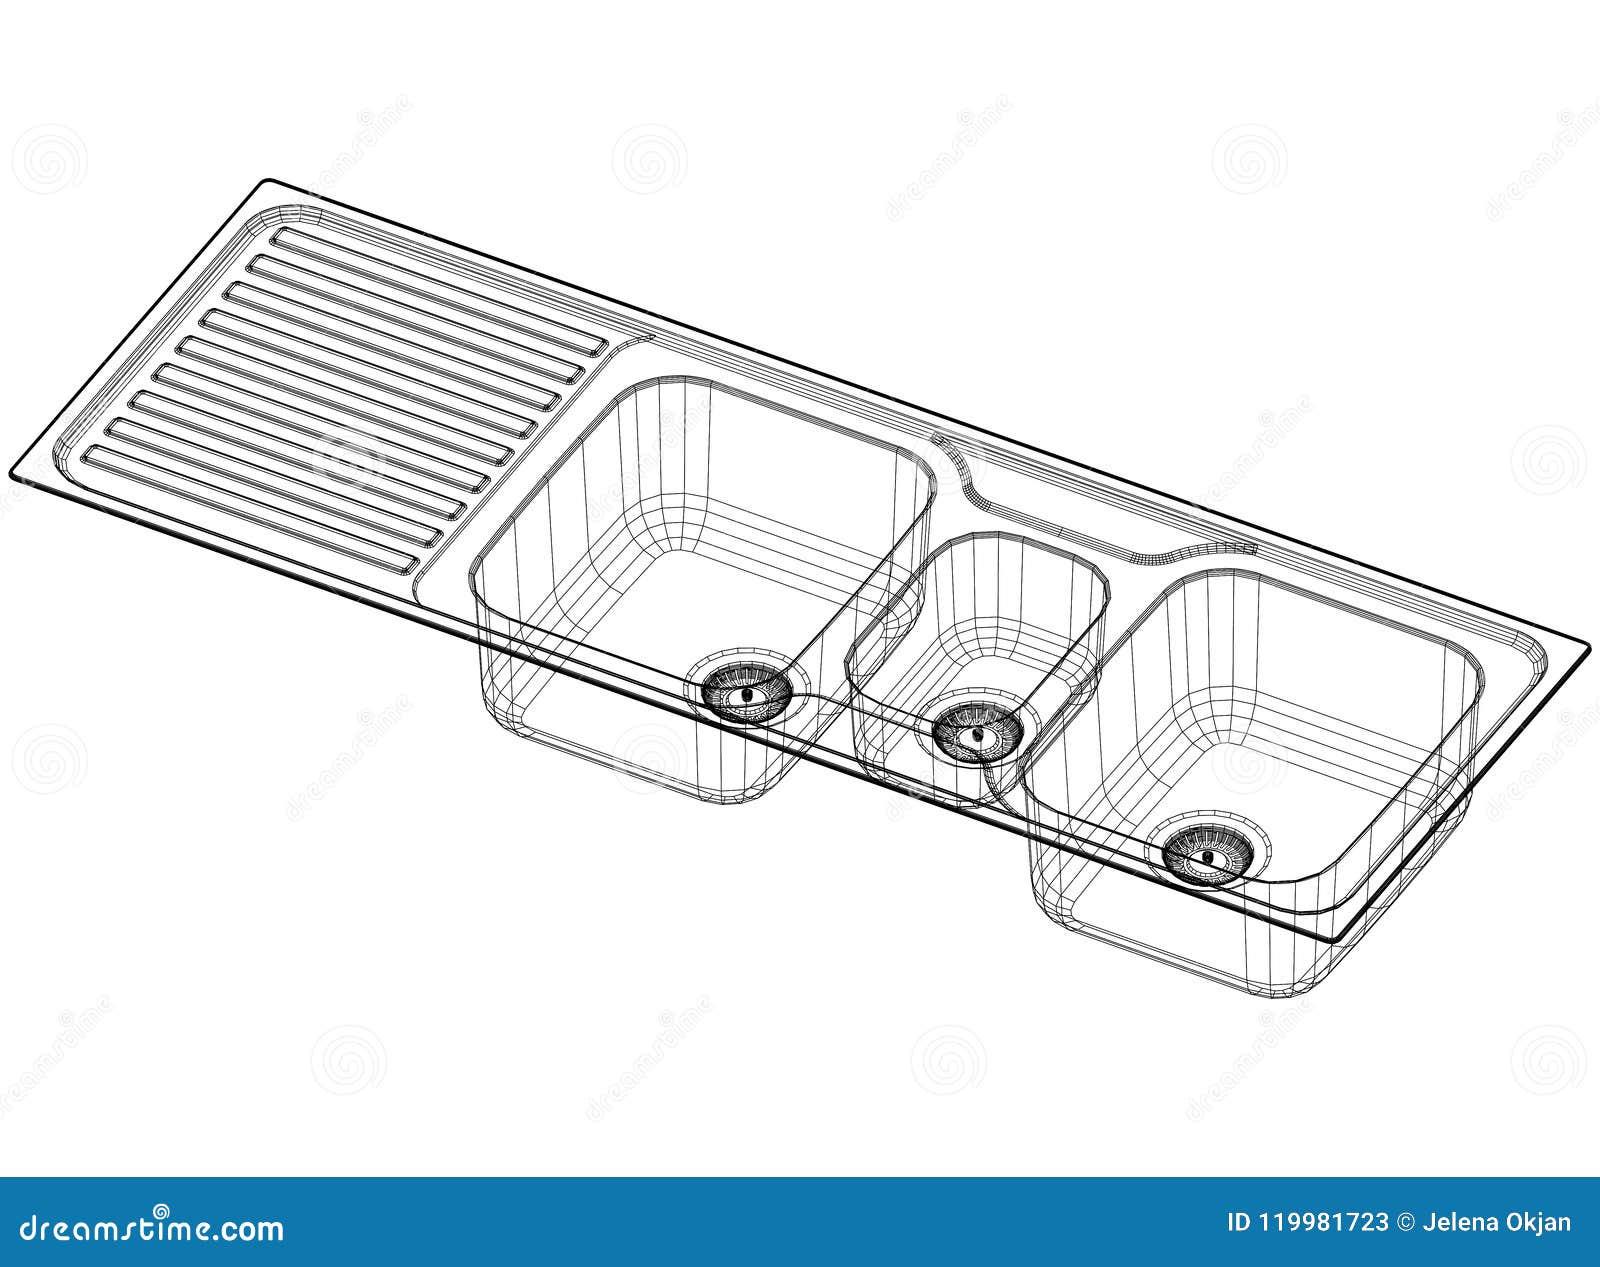 Sink Concept Architect Blueprint Isolated Stock Illustration